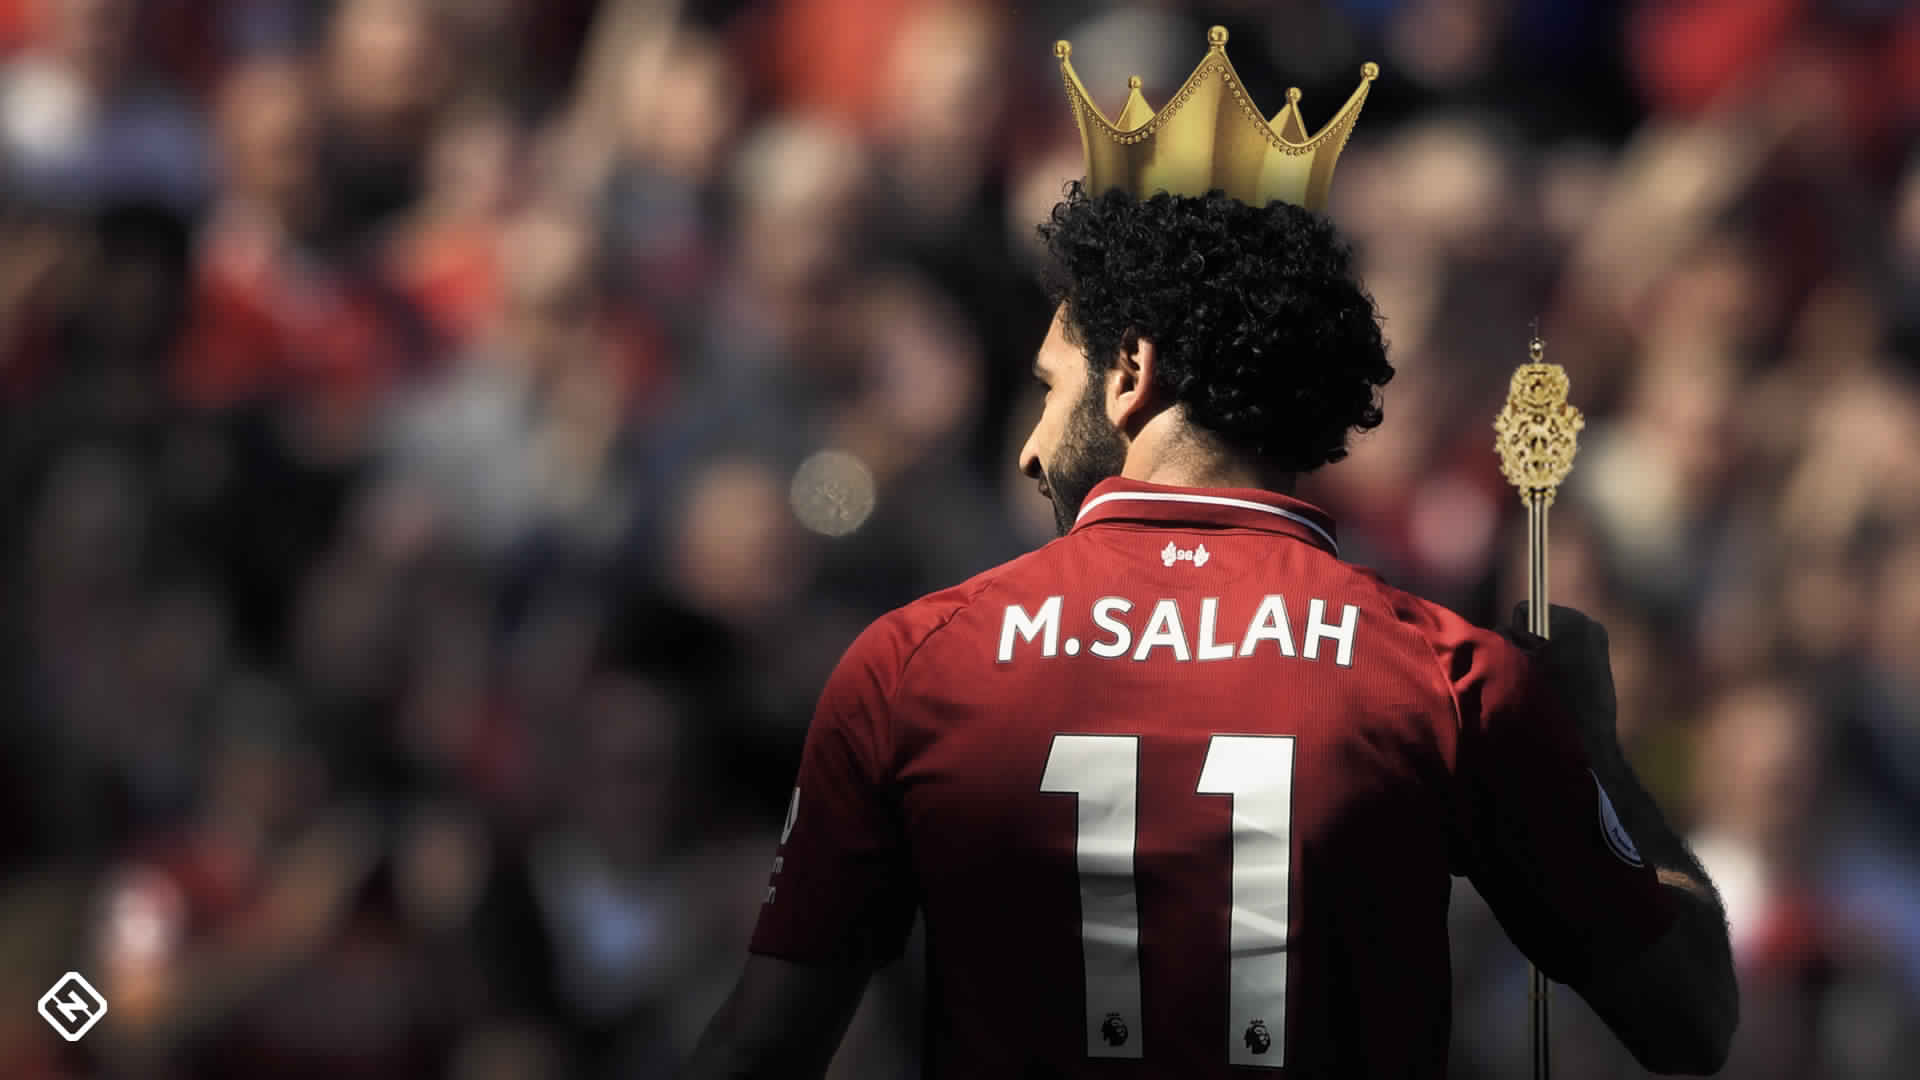 mohamed salah bilder2 - 11 Mohamed Salah Bilder